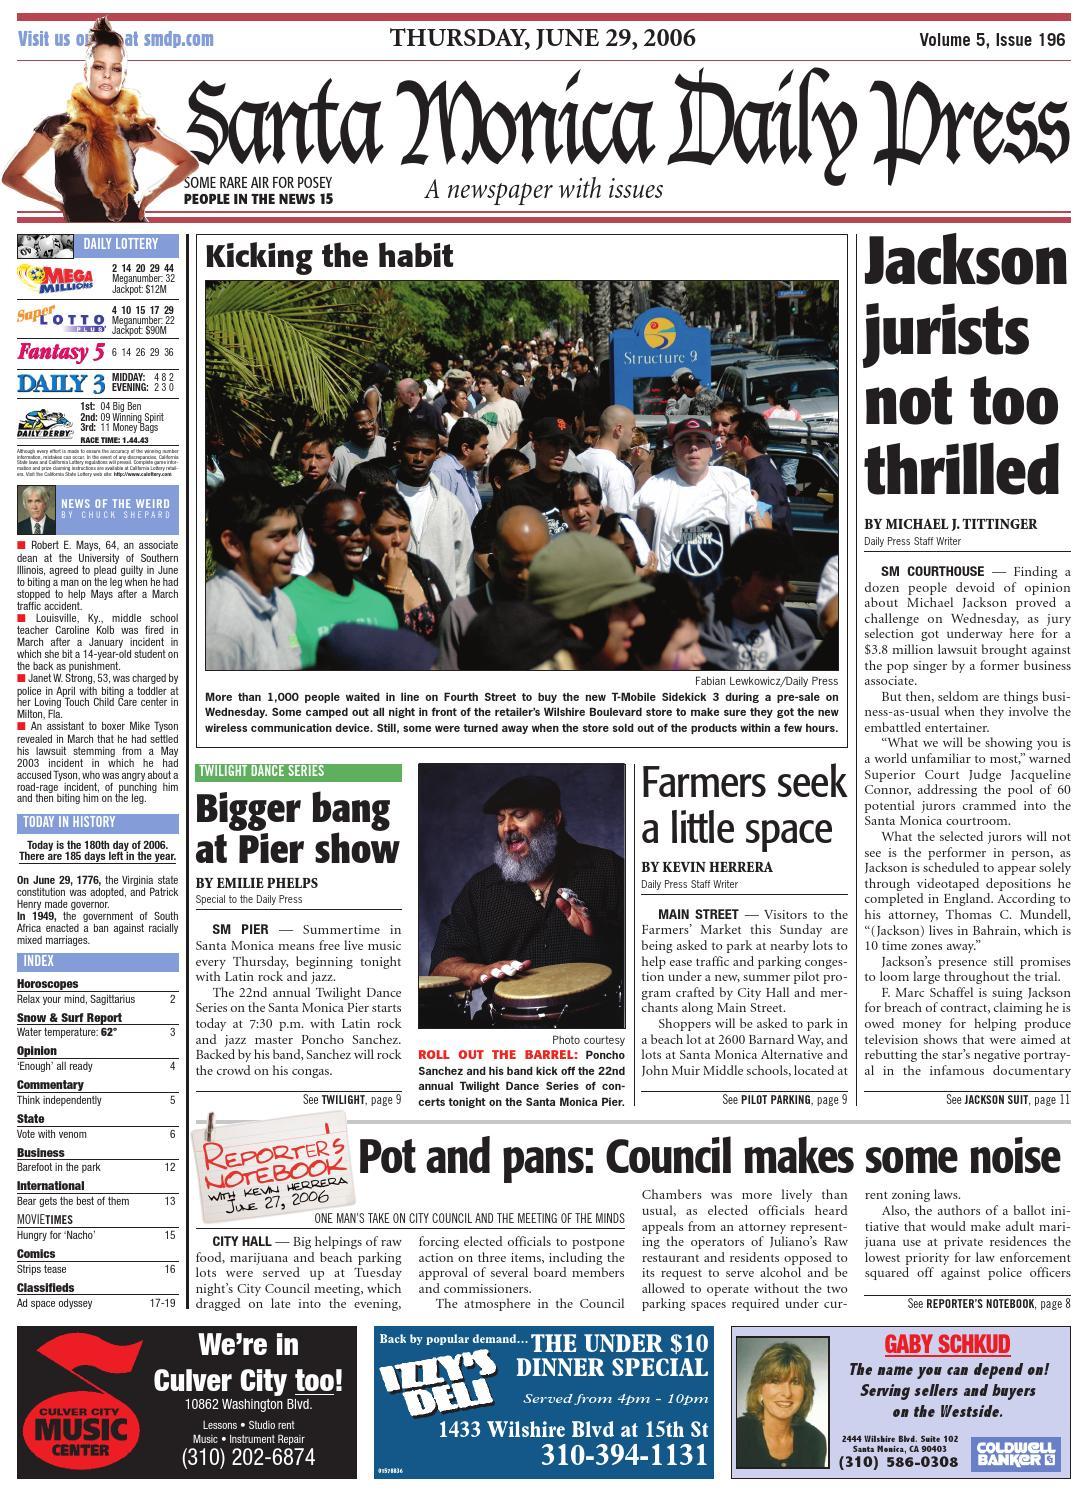 Santa Monica Daily Press, June 29, 2006